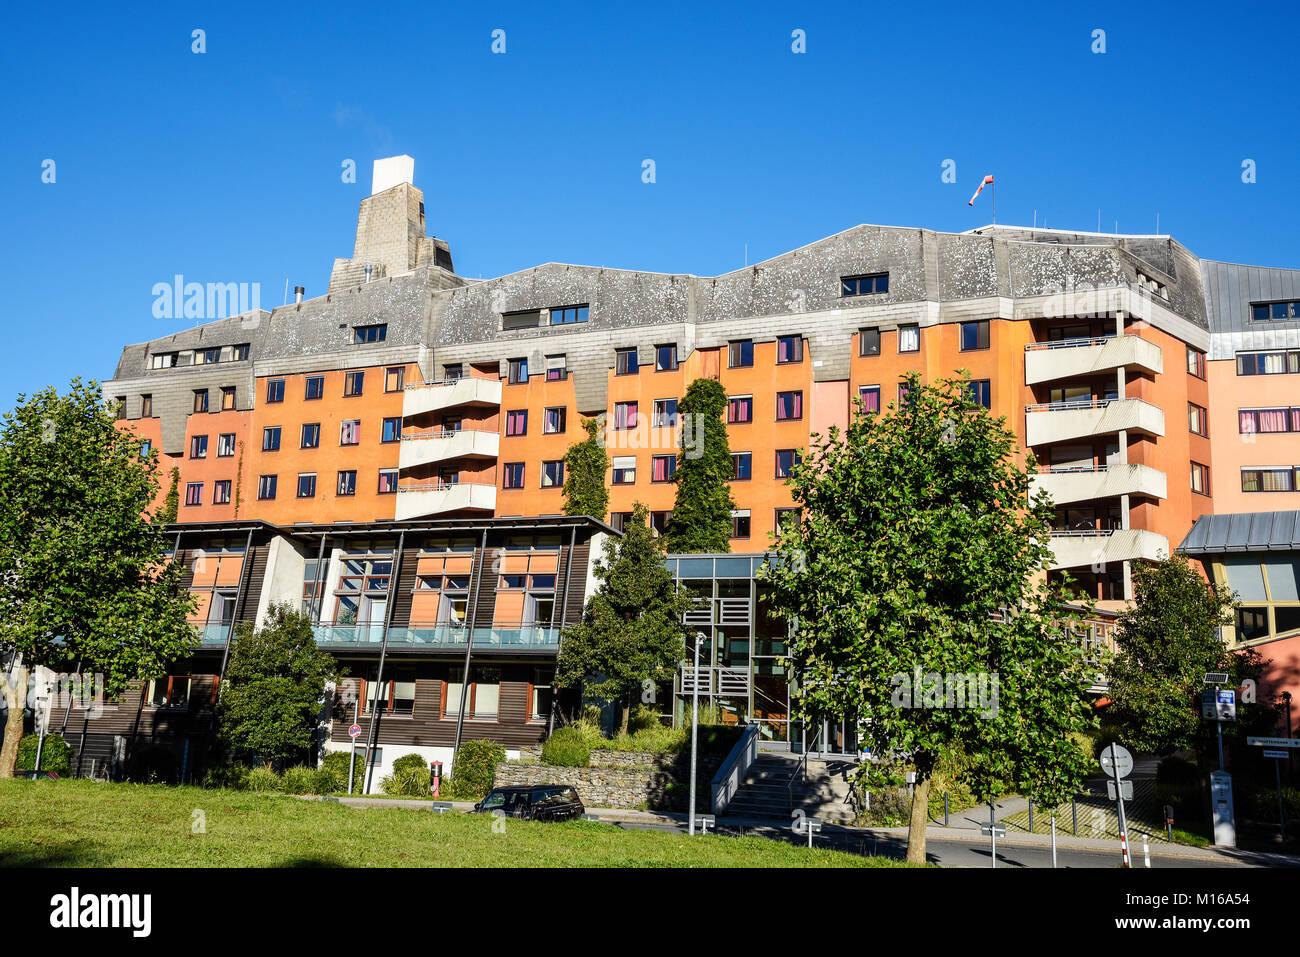 Community hospital, anthroposophic hospital, Herdecke, Dortmund, North Rhine-Westphalia, Germany - Stock Image